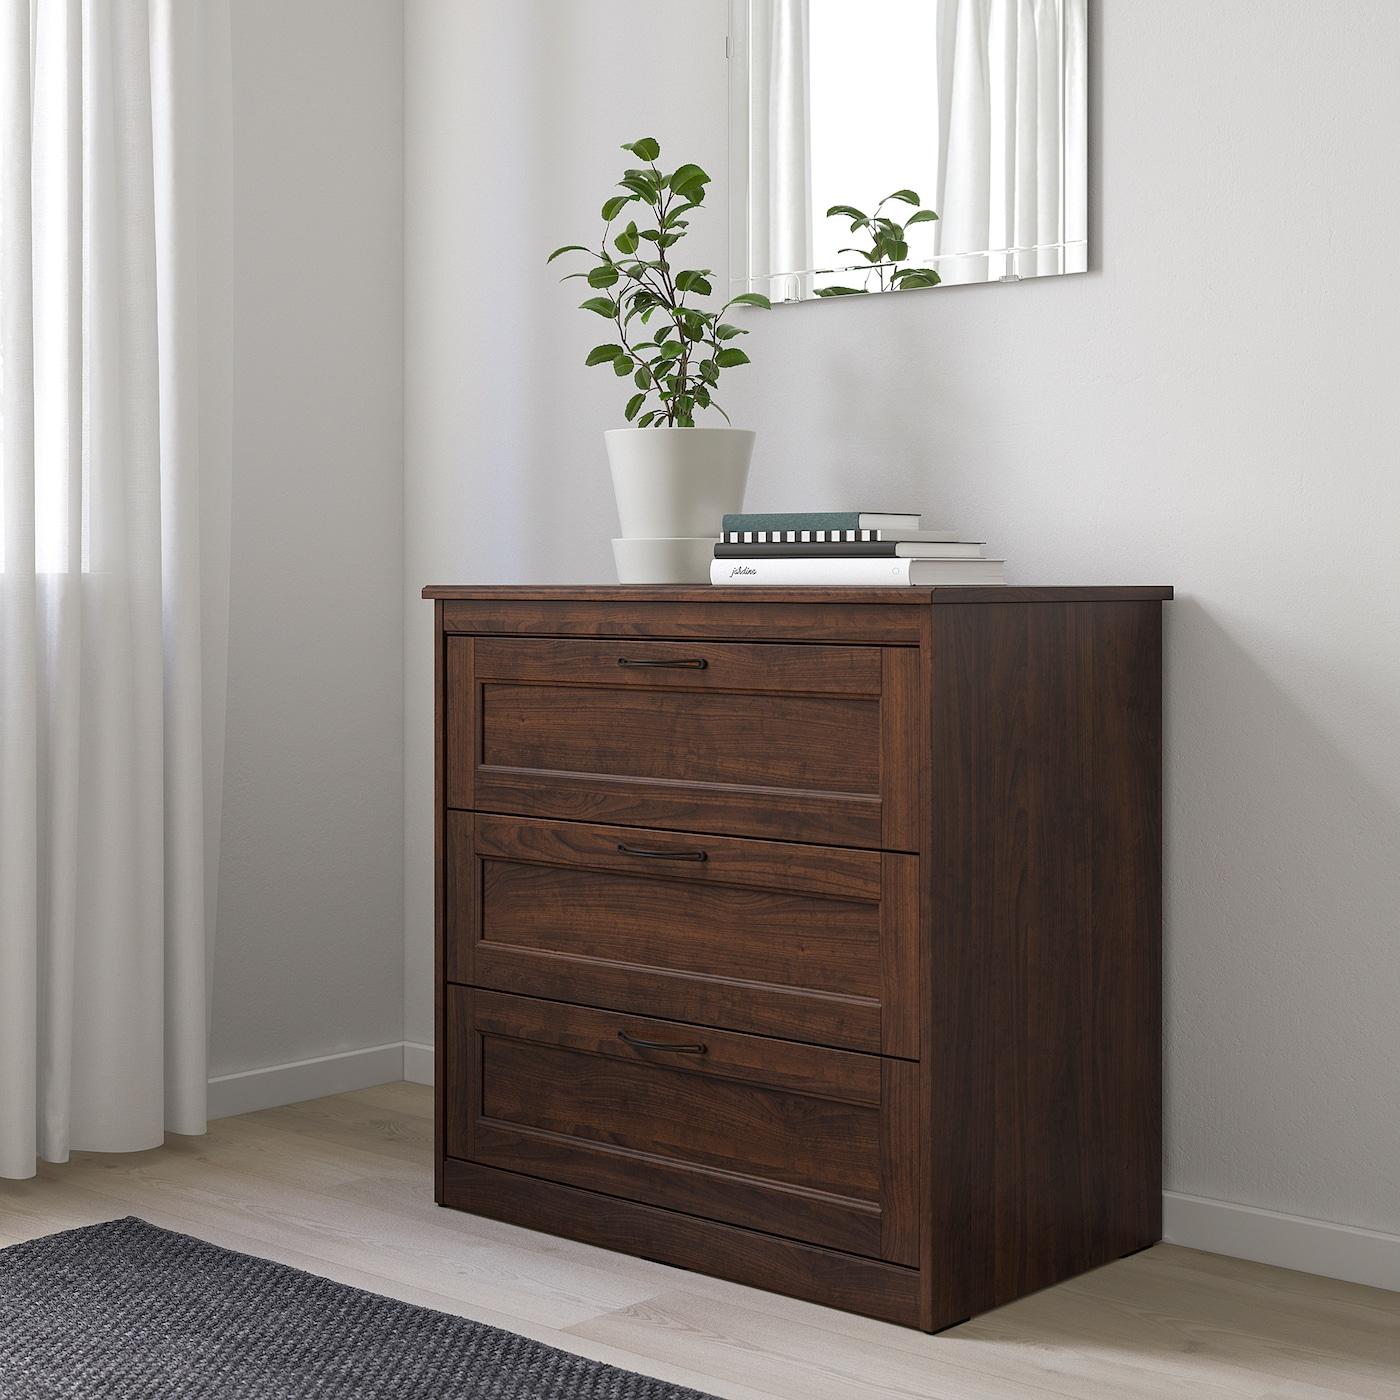 "SONGESAND 3-drawer chest, brown, 32 1/4x31 7/8 """